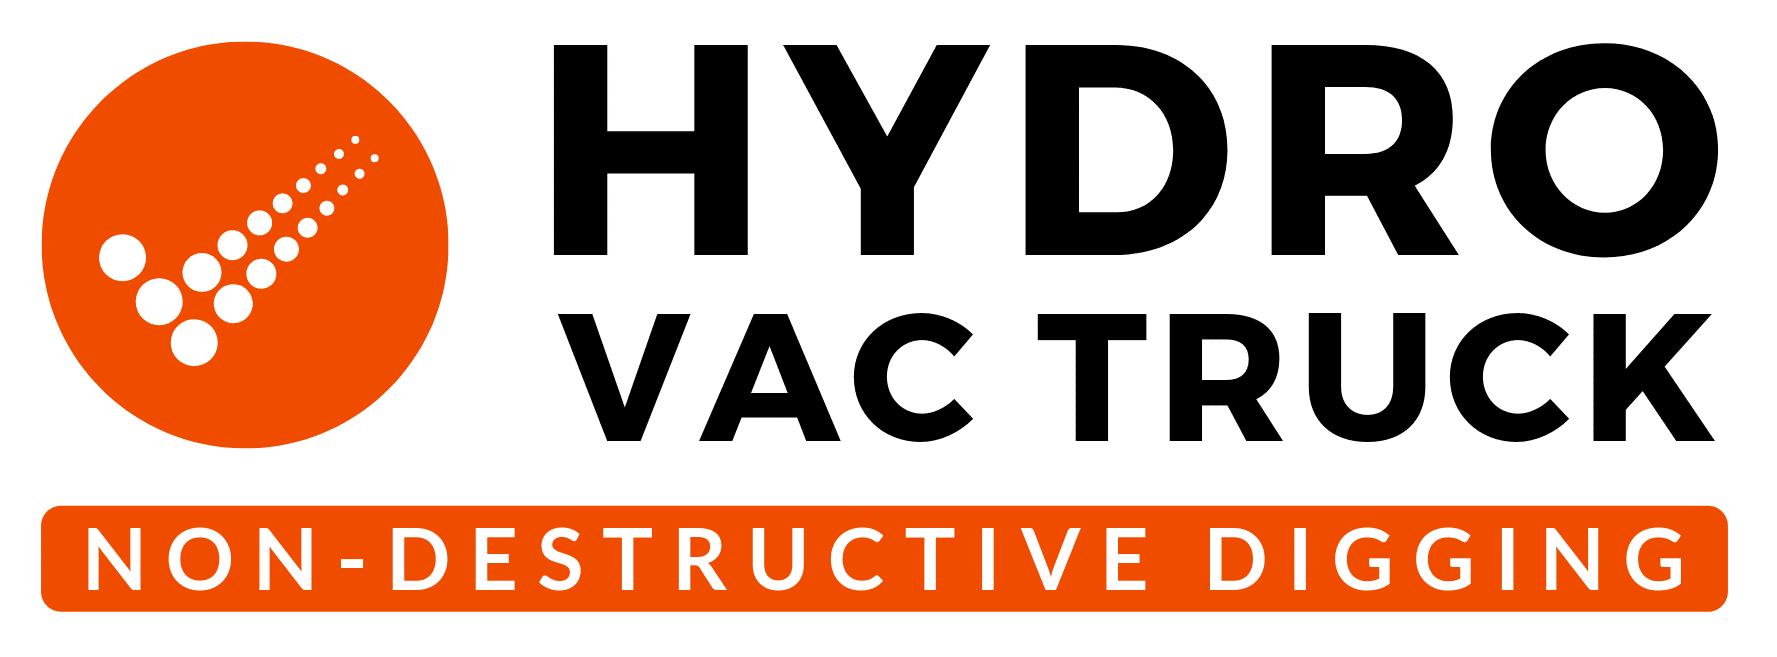 Hydro Excavation | Vac Truck Hire | Non Destructive Digging